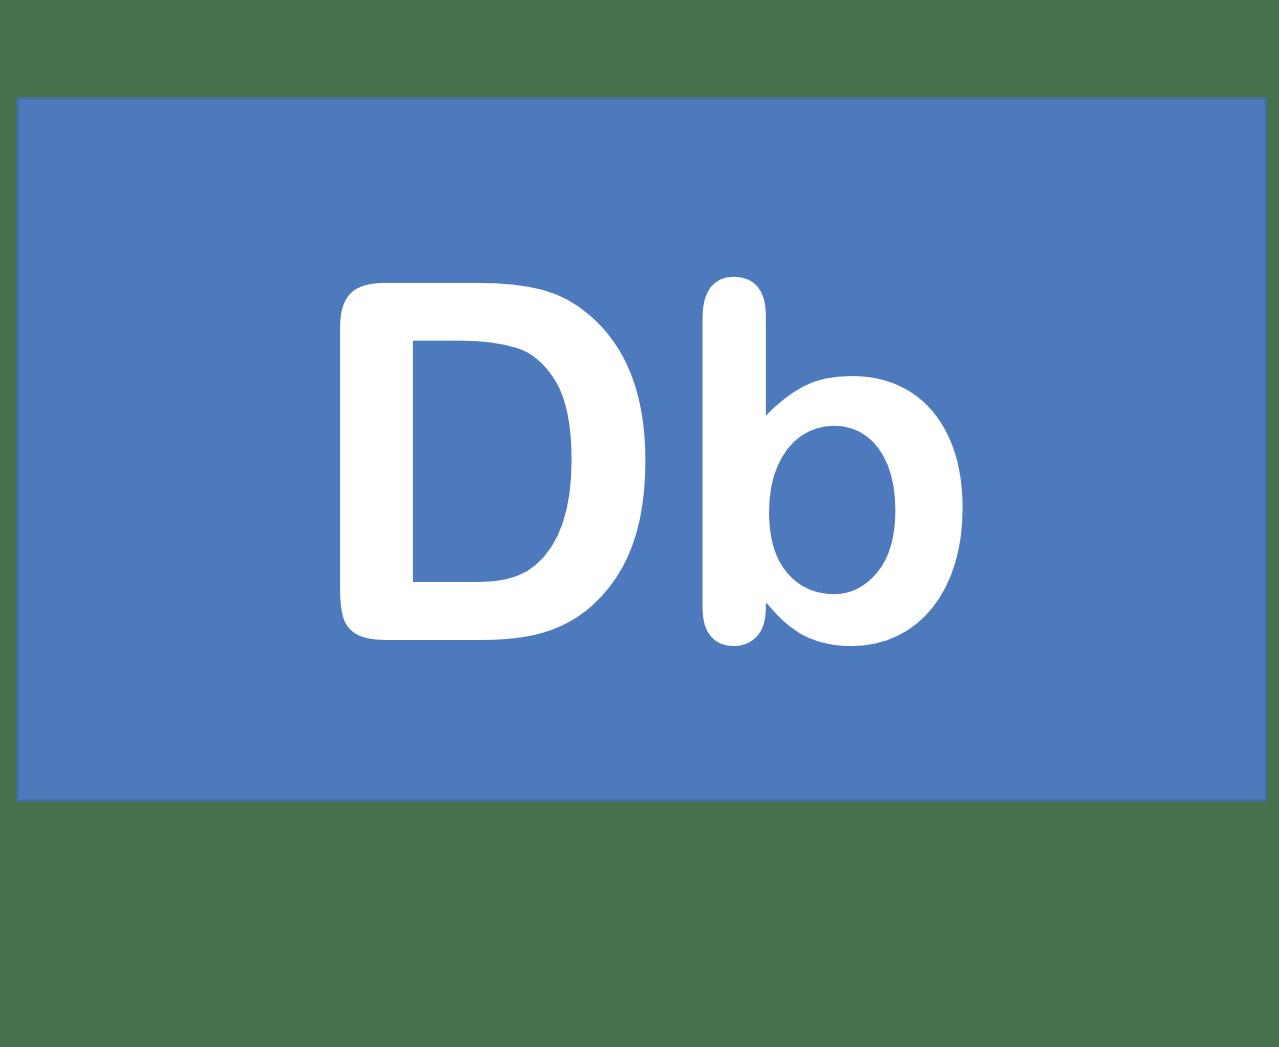 105 Db ドブニウム Dobnium 元素 記号 周期表 化学 原子